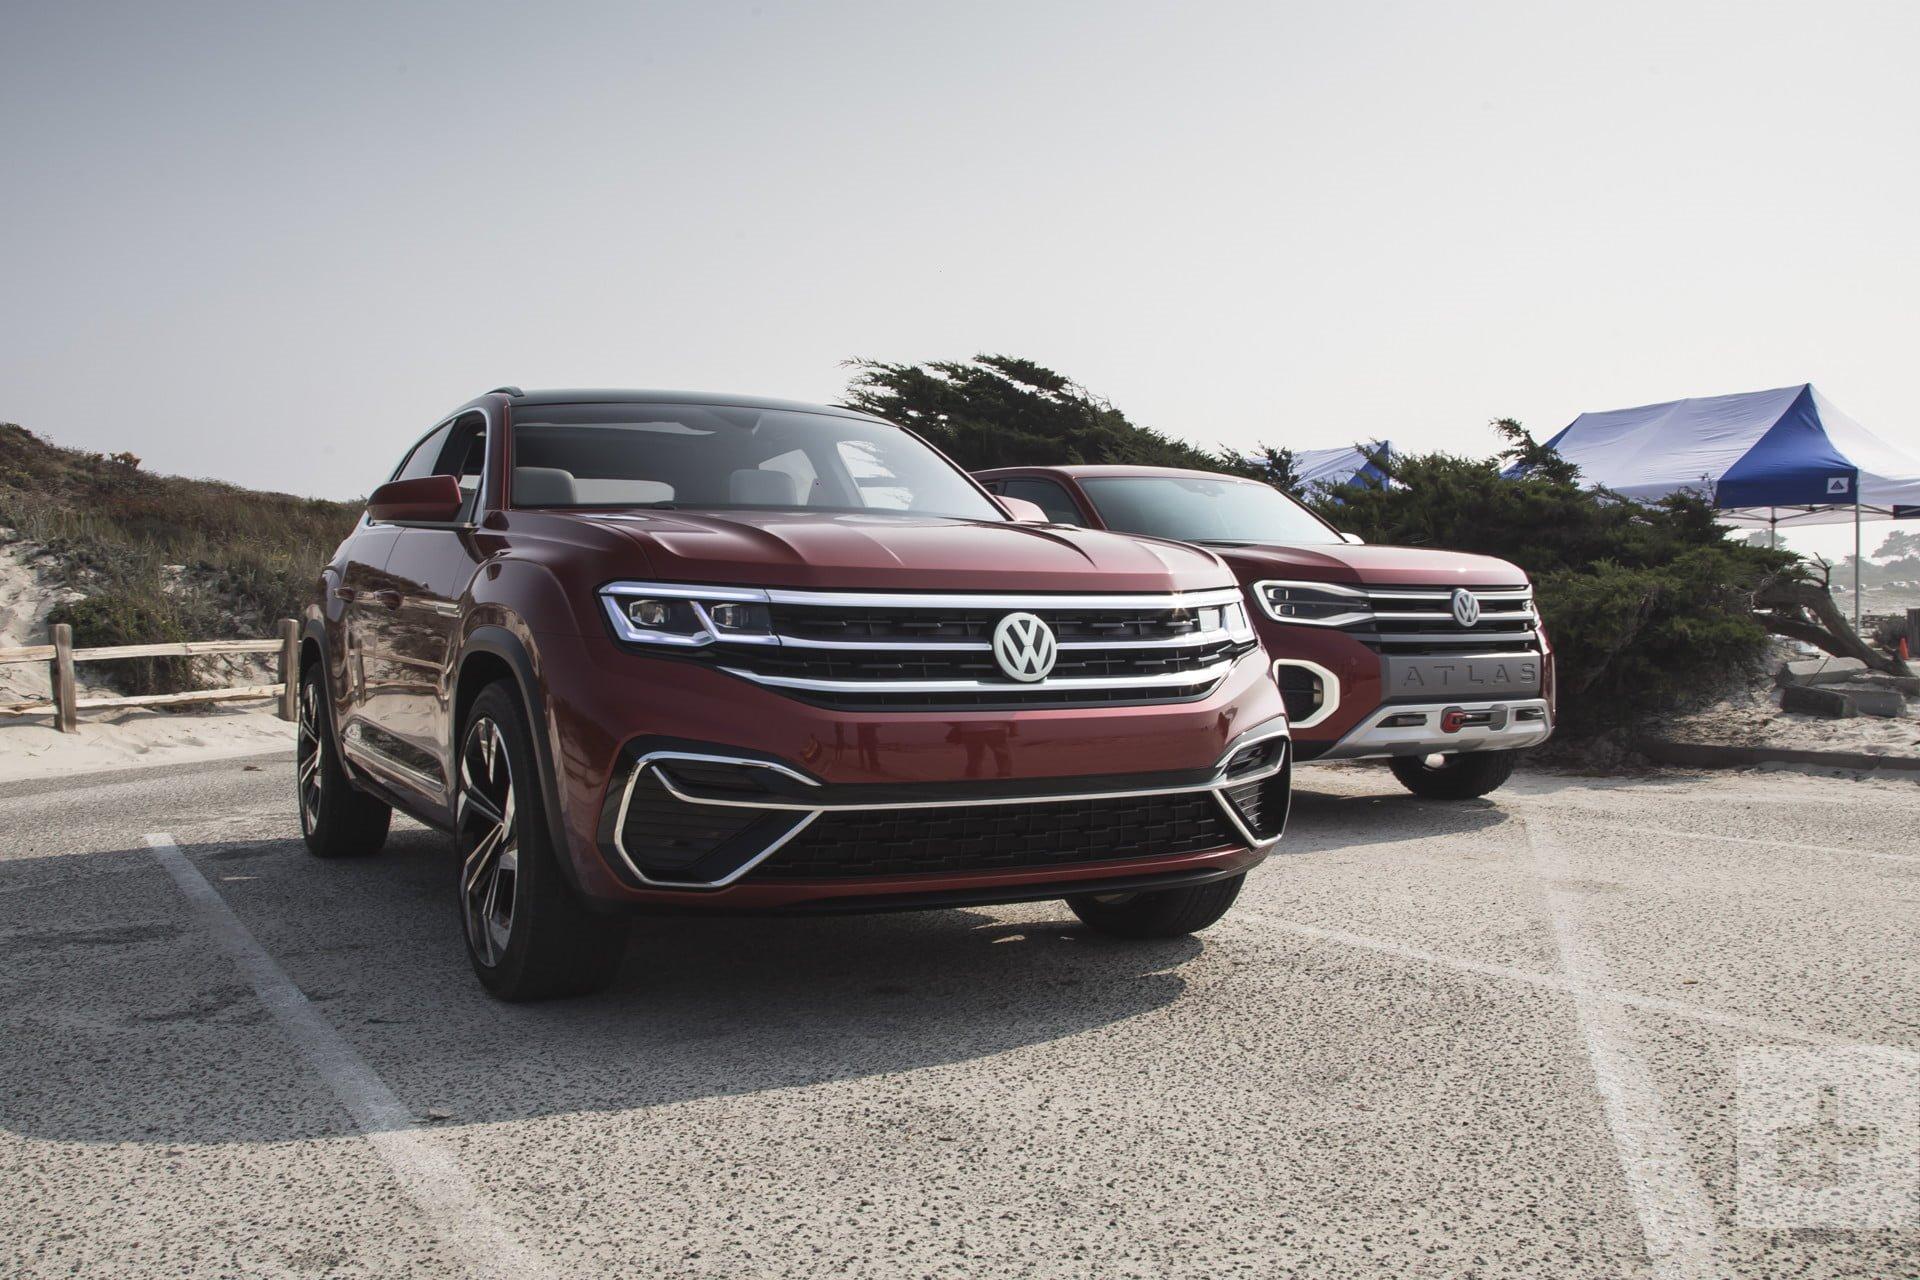 New 2019 Volkswagen-Atlas V6 SE 4Motion Atlas V6 SE 4Motion for sale $37,295 at M and V Leasing in Brooklyn NY 11223 1